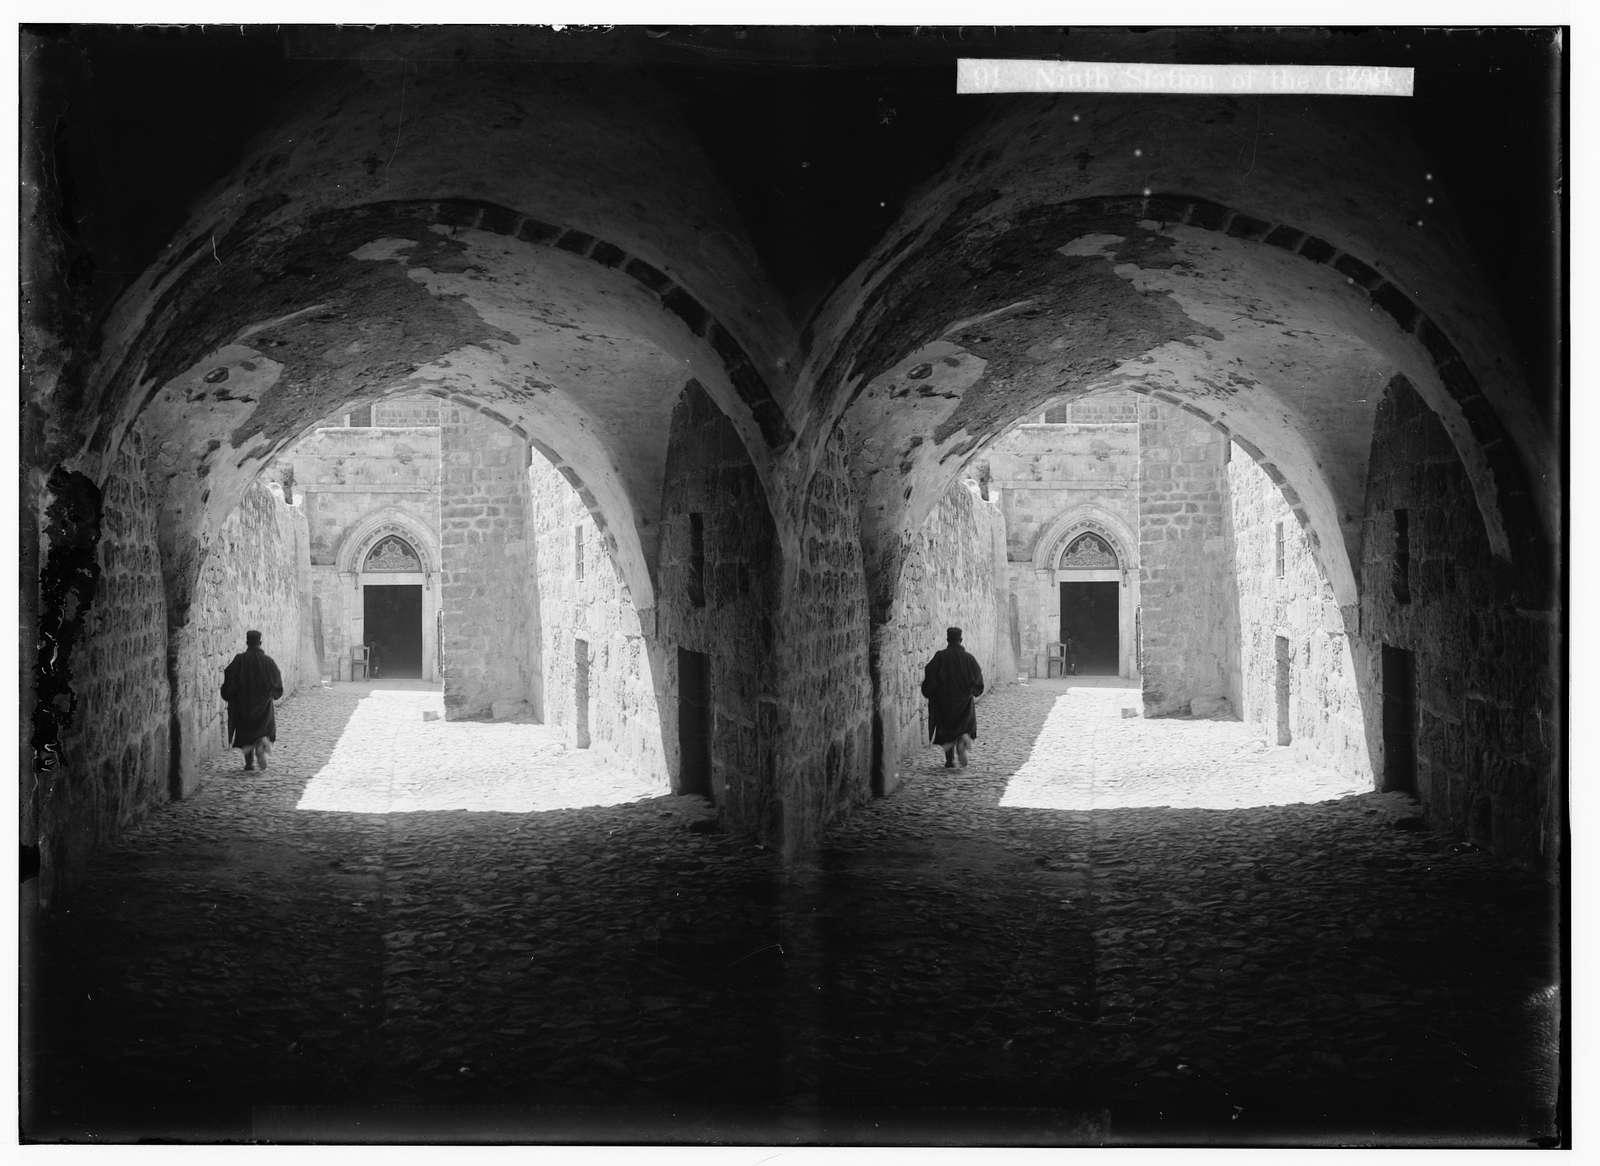 Via Dolorosa, beginning at St. Stephen's Gate. Ninth Station of the Cross